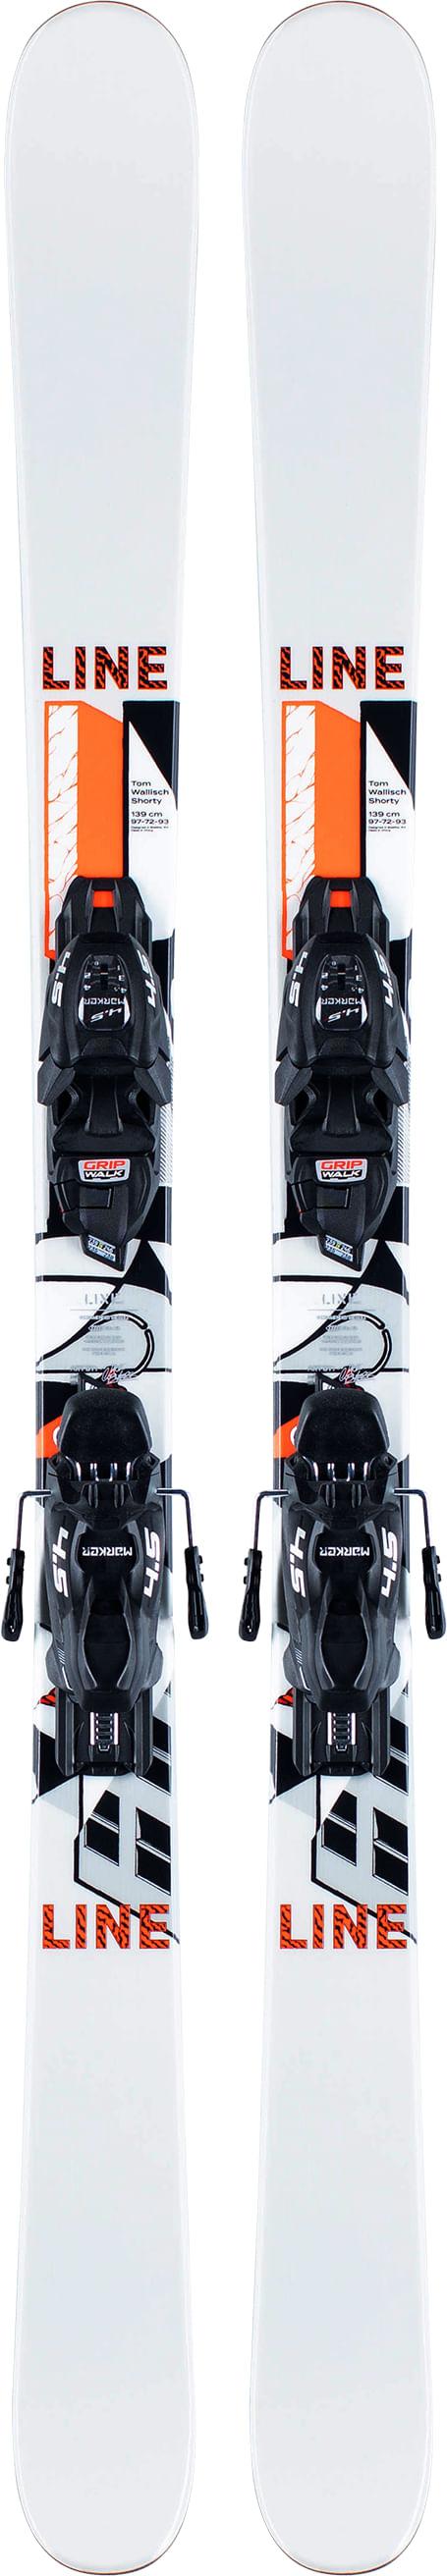 Line-Tom-Wallisch-Shorty-Ski-Package-2021